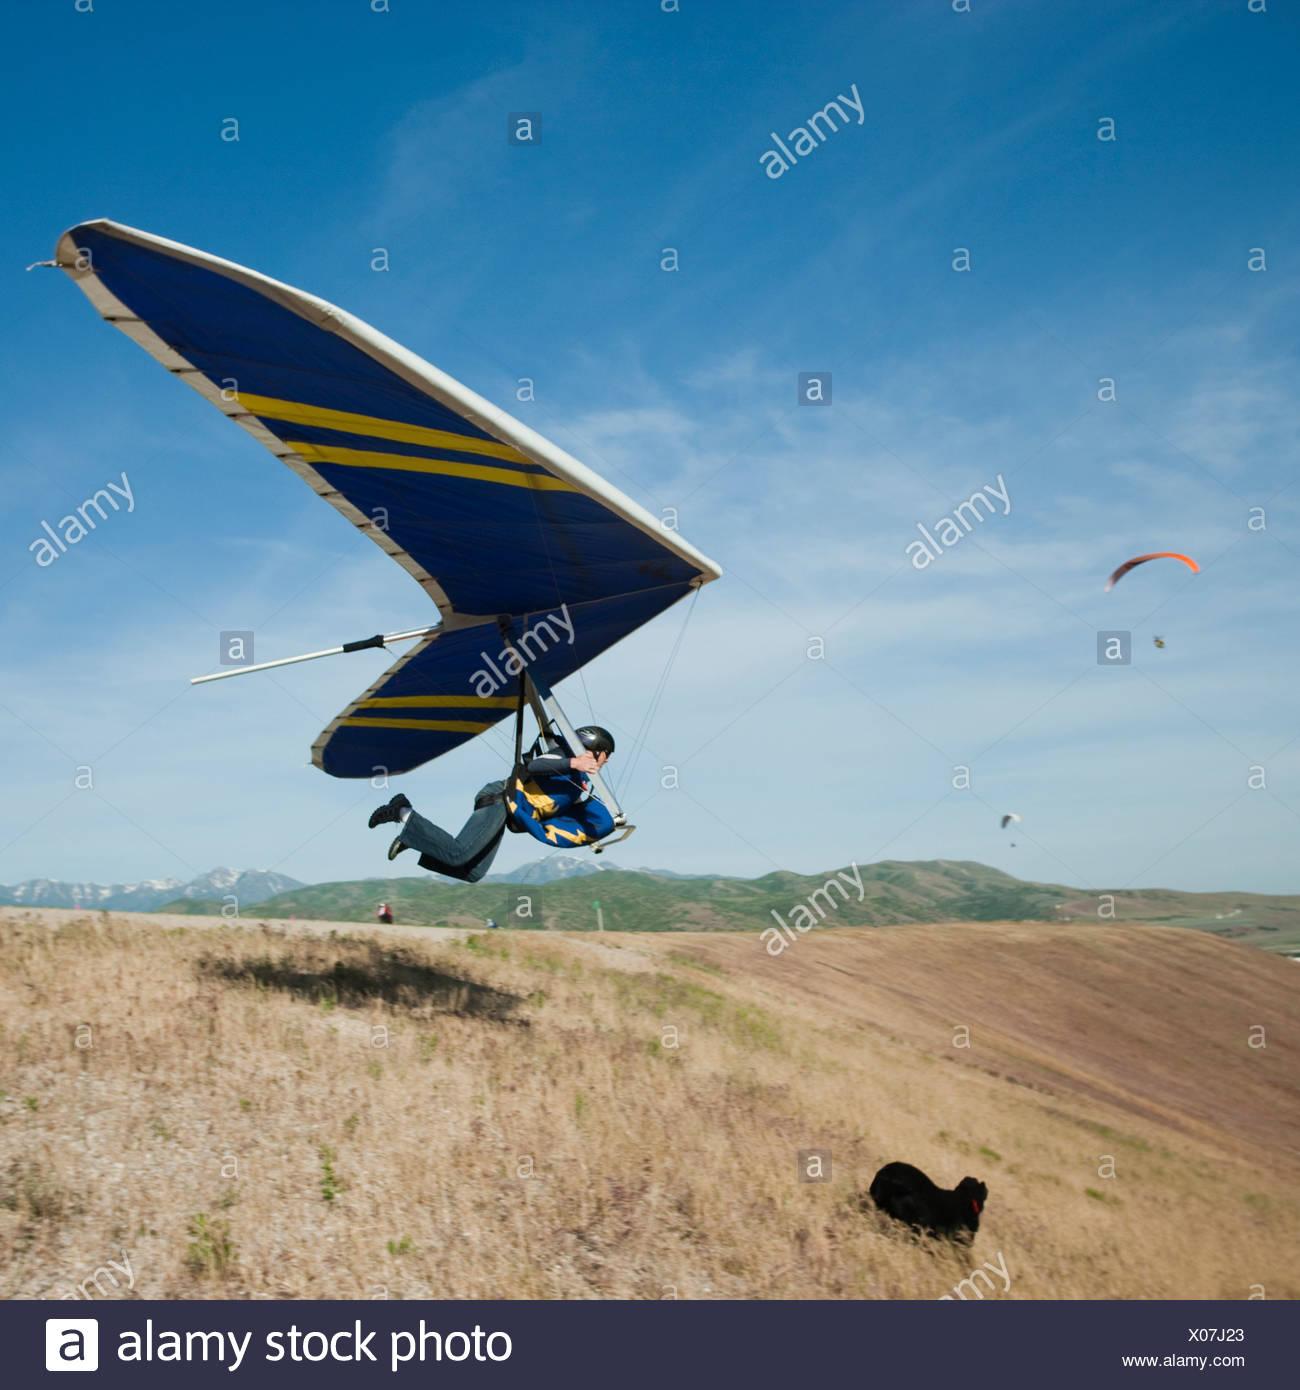 USA, Utah, Lehi, young man taking off with hang glider - Stock Image